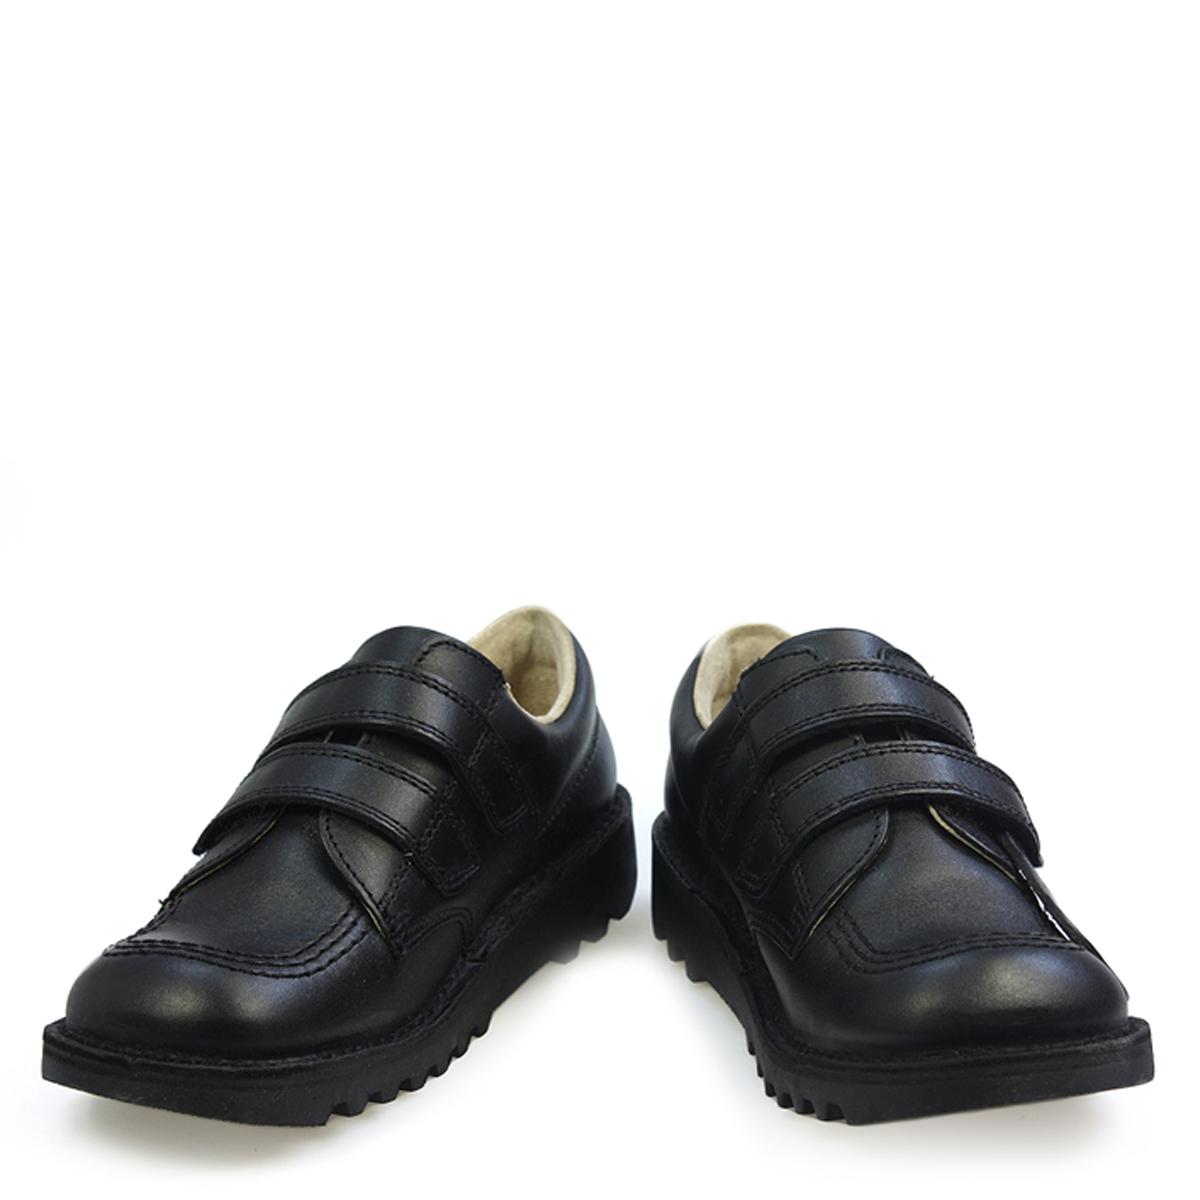 Kickers Kick Lo Vel Boys School Shoes